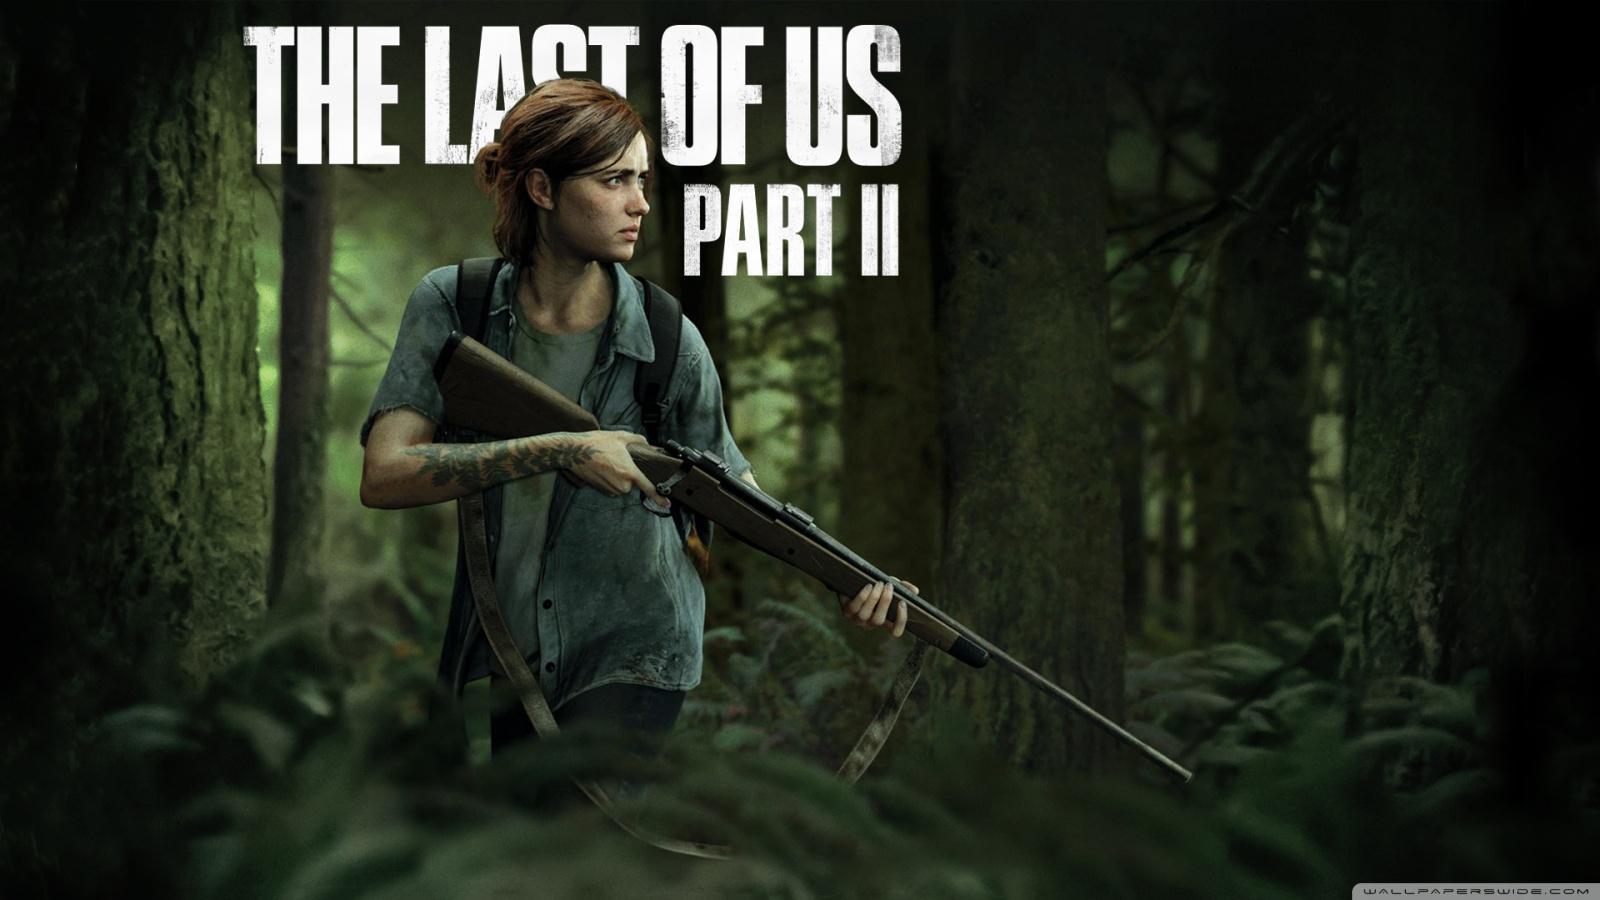 The Last Of Us 2 Desktop Wallpapers - Wallpaper Cave